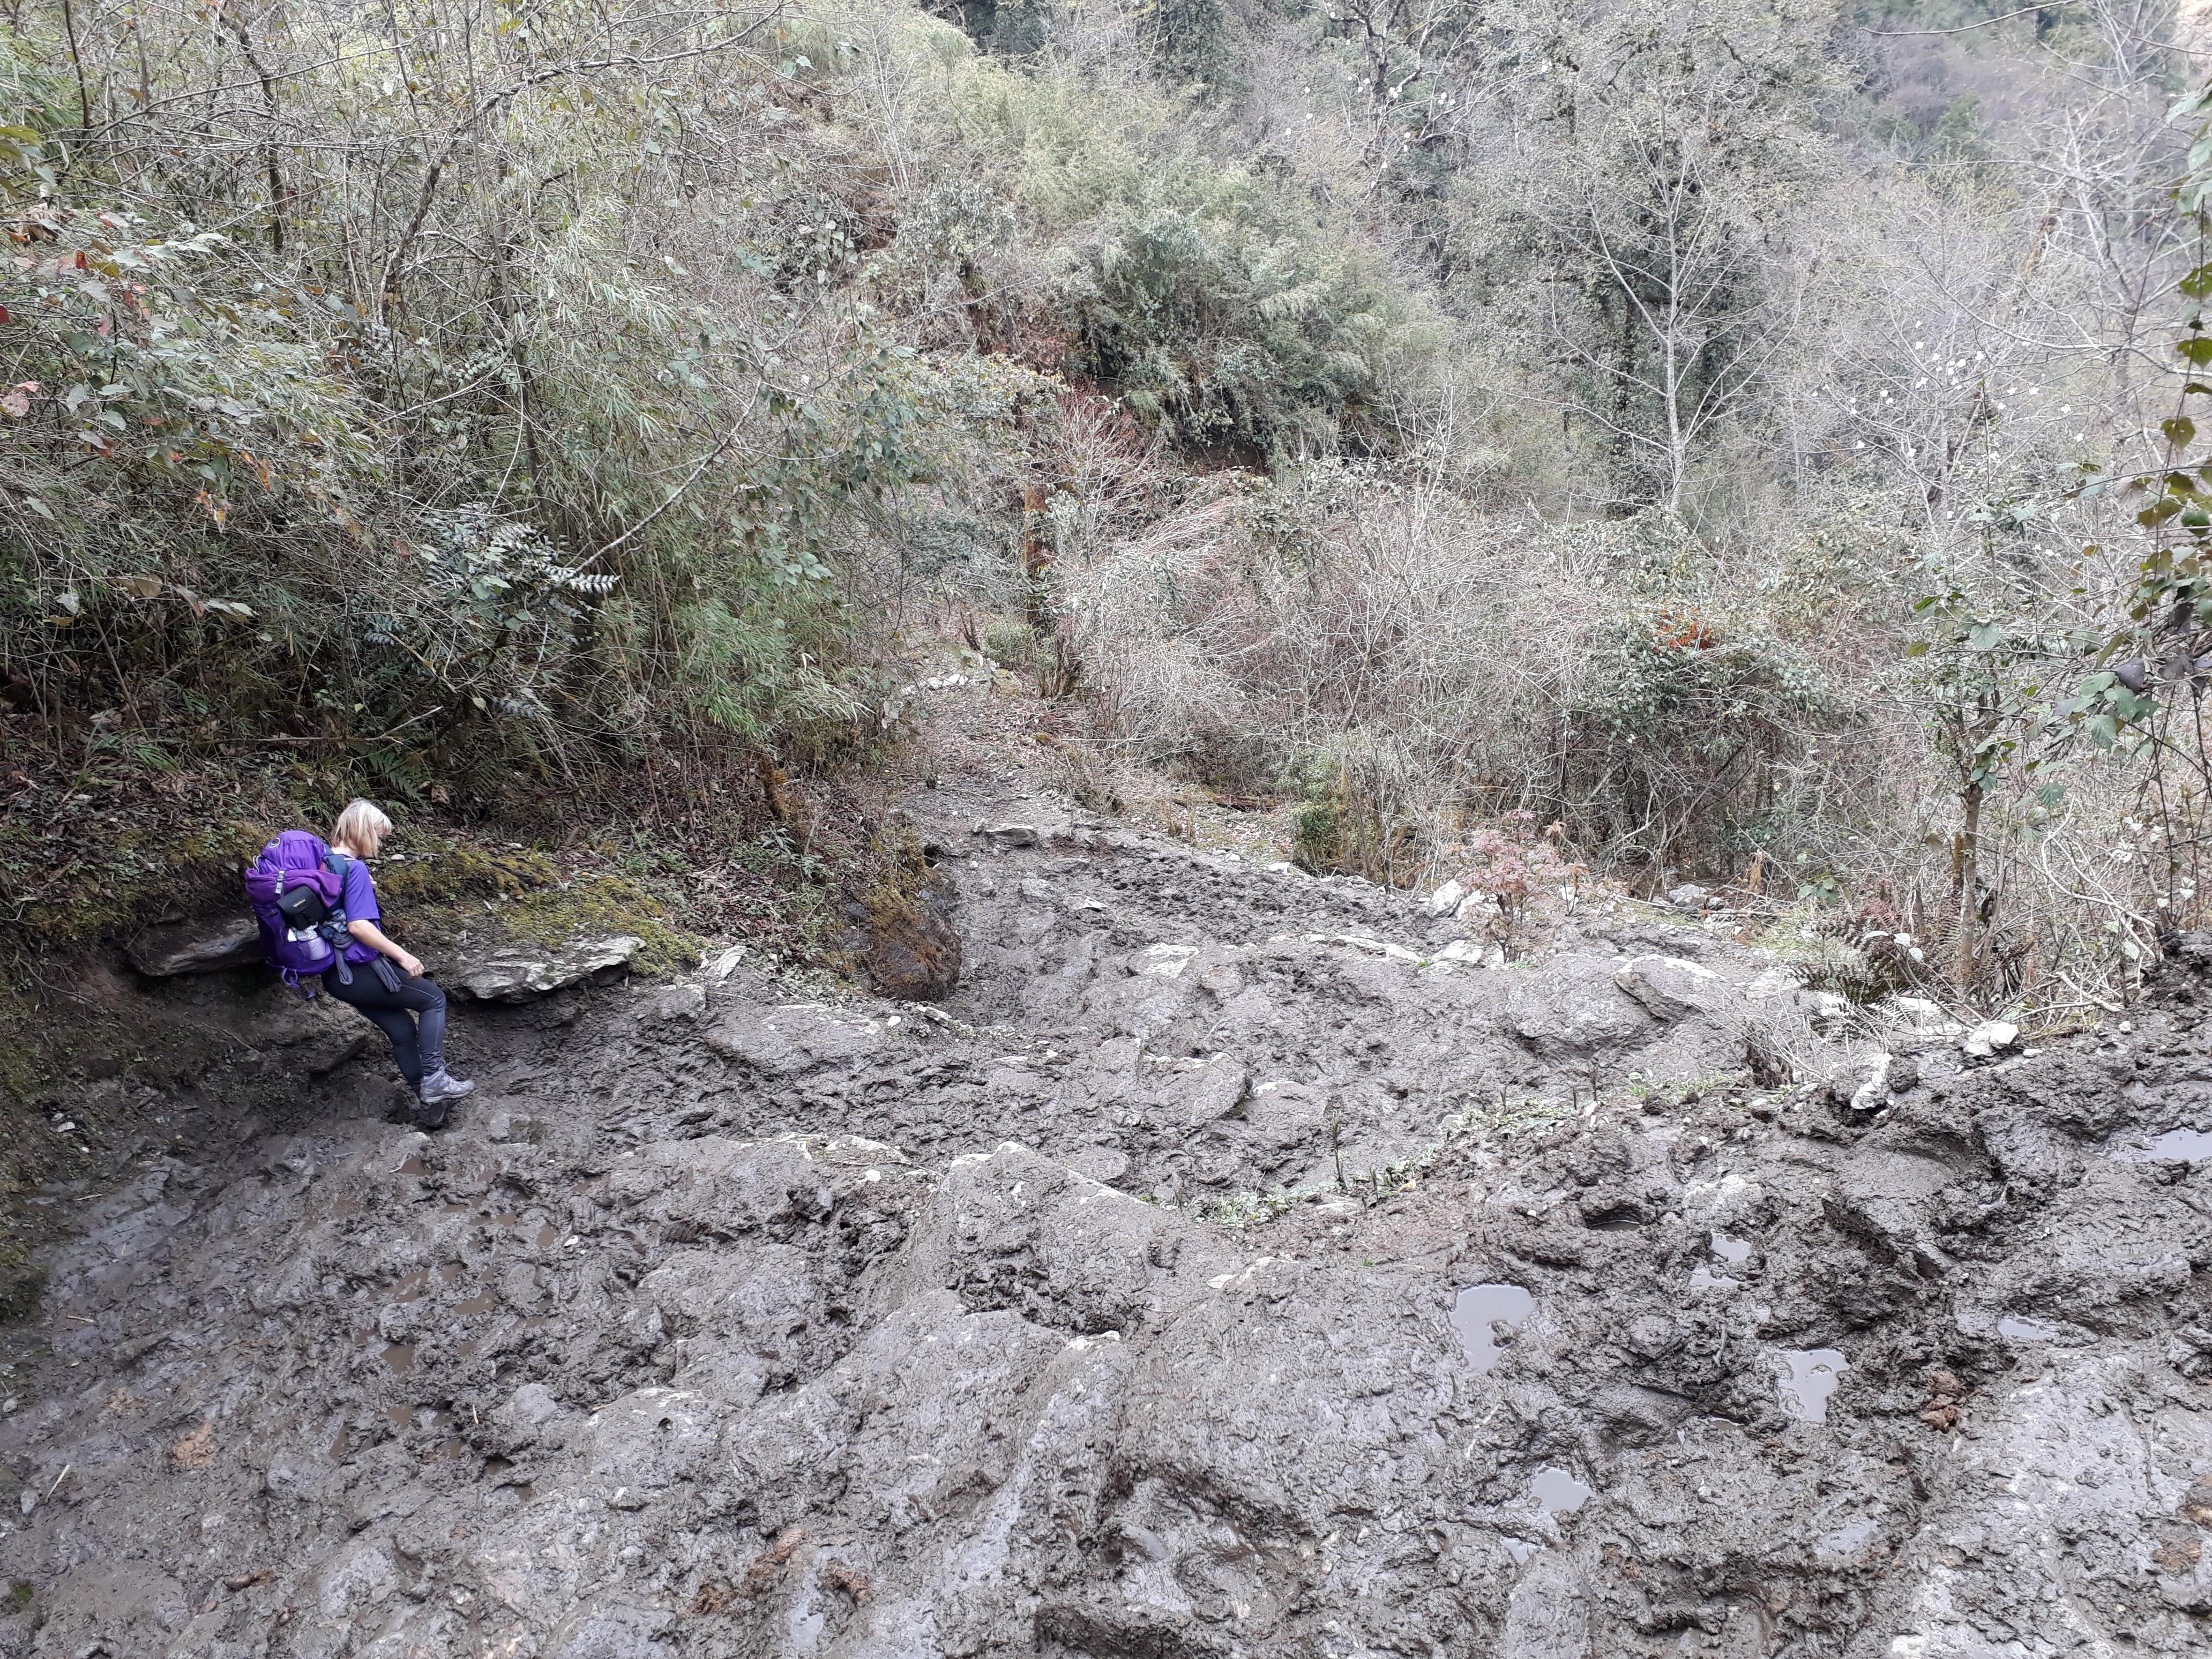 Everest Base Camp Trek - The Muddy Trail